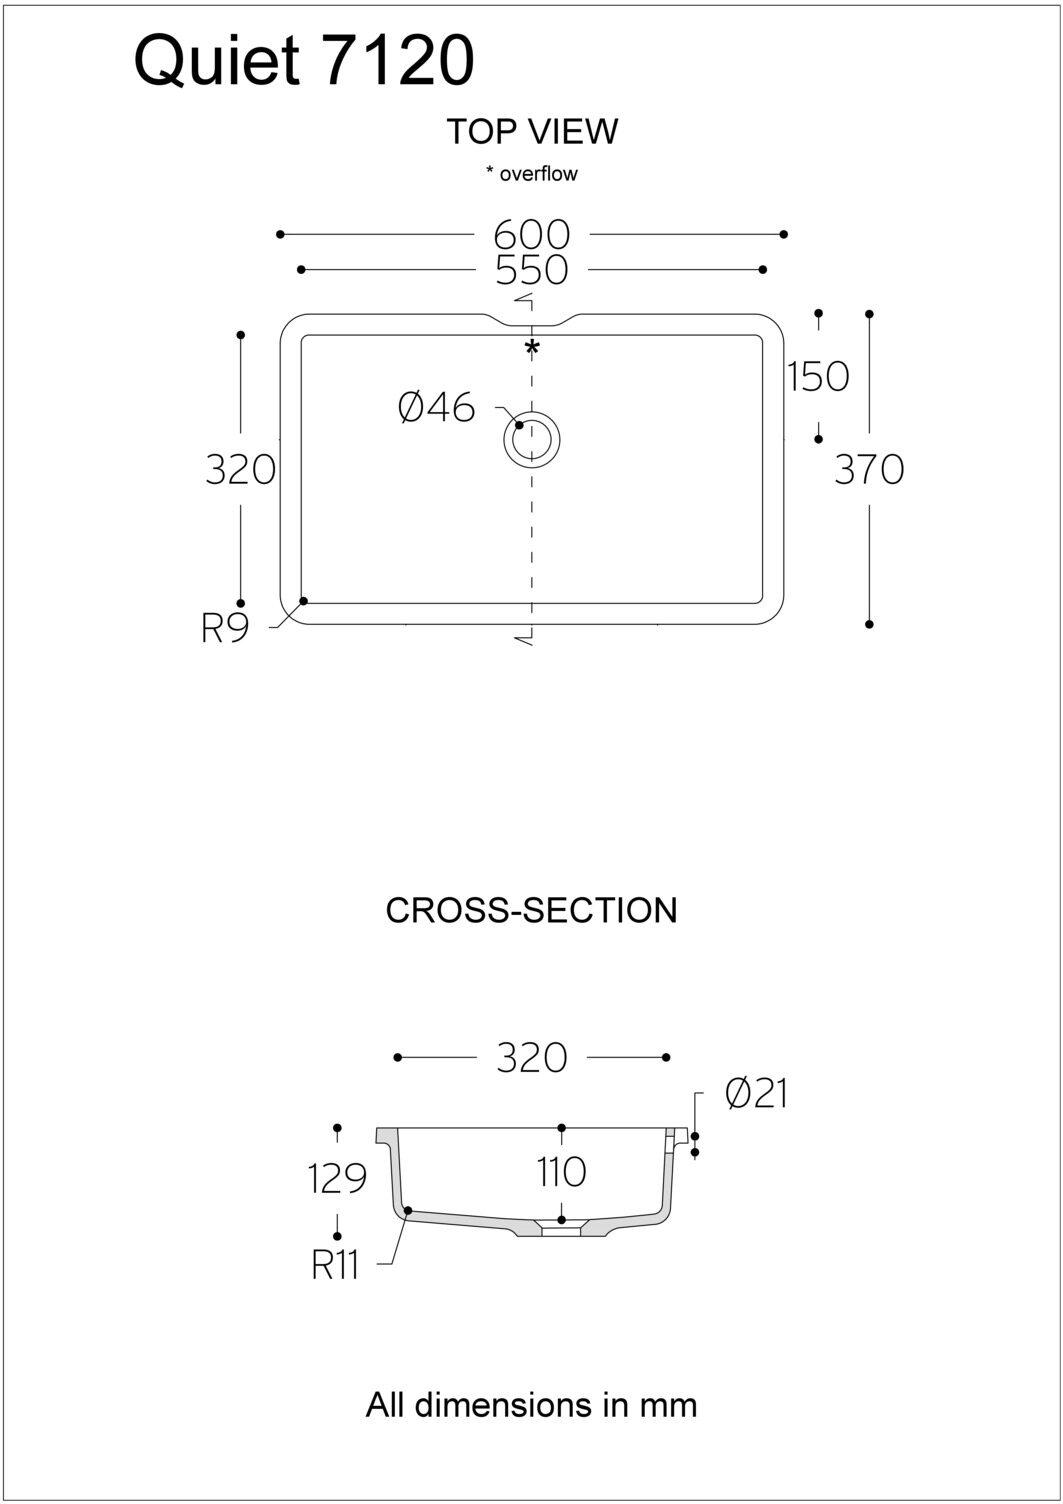 DUPONT_CORIAN_QUIET7120_2D_PDF-2020[0]